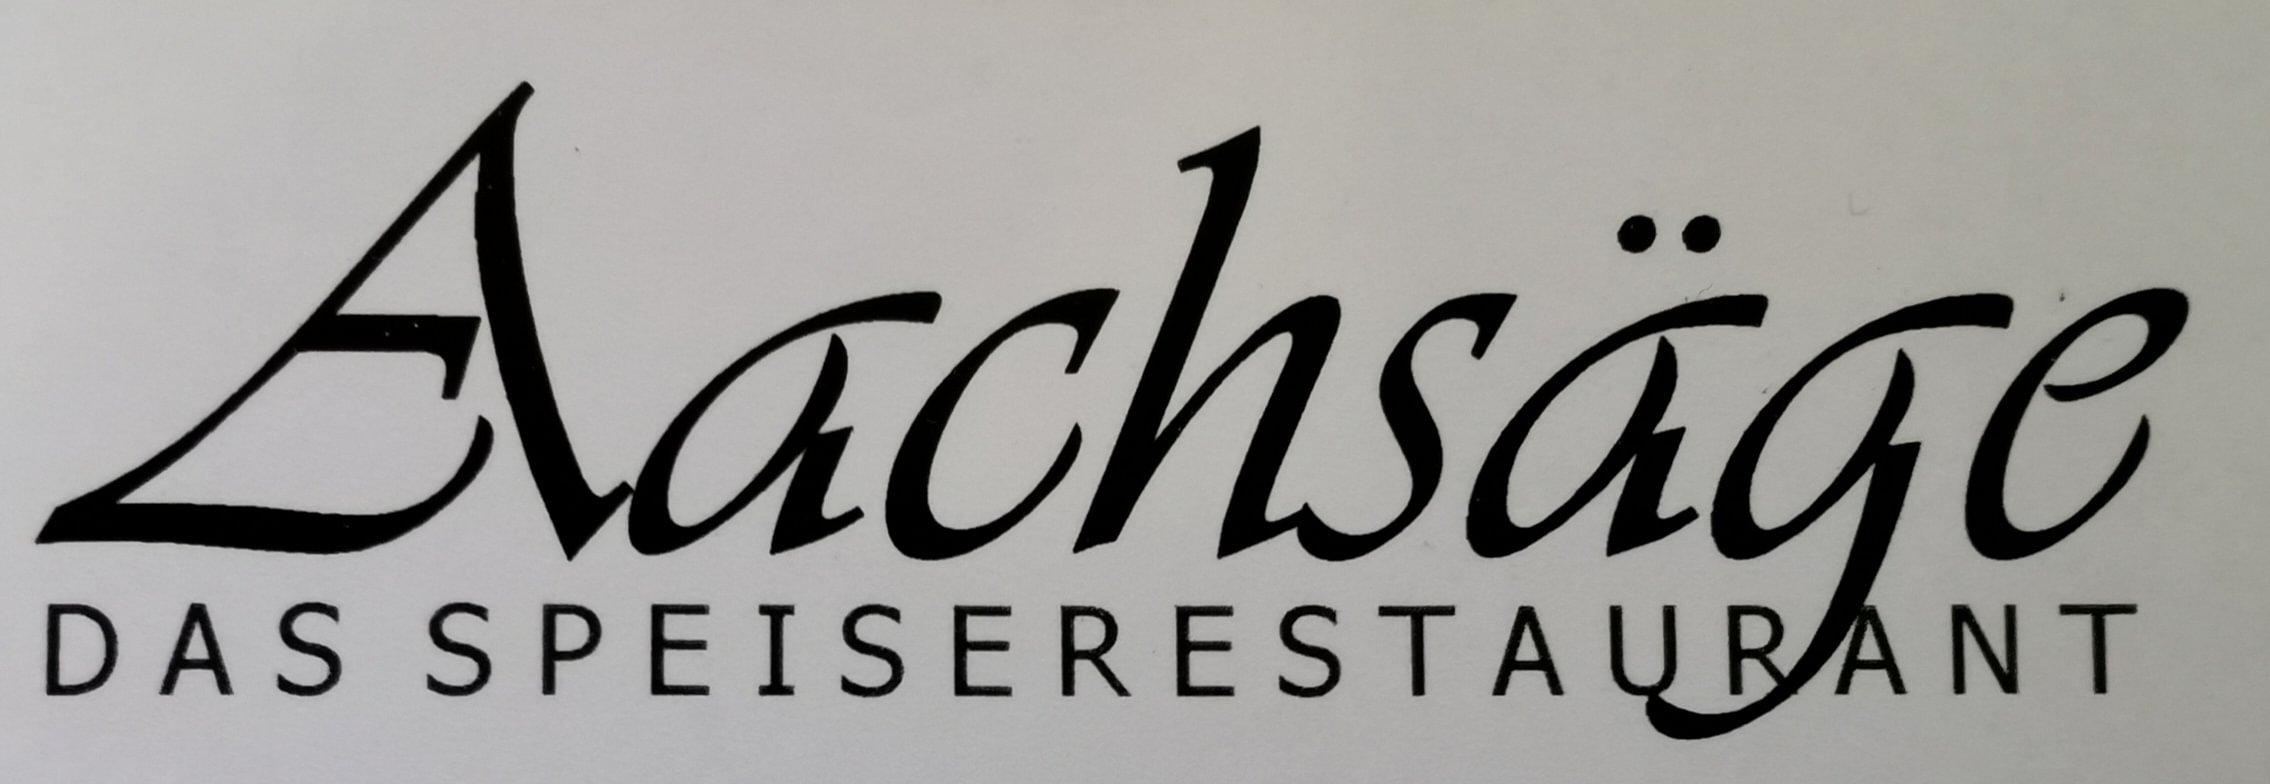 Restaurant Aachsäge